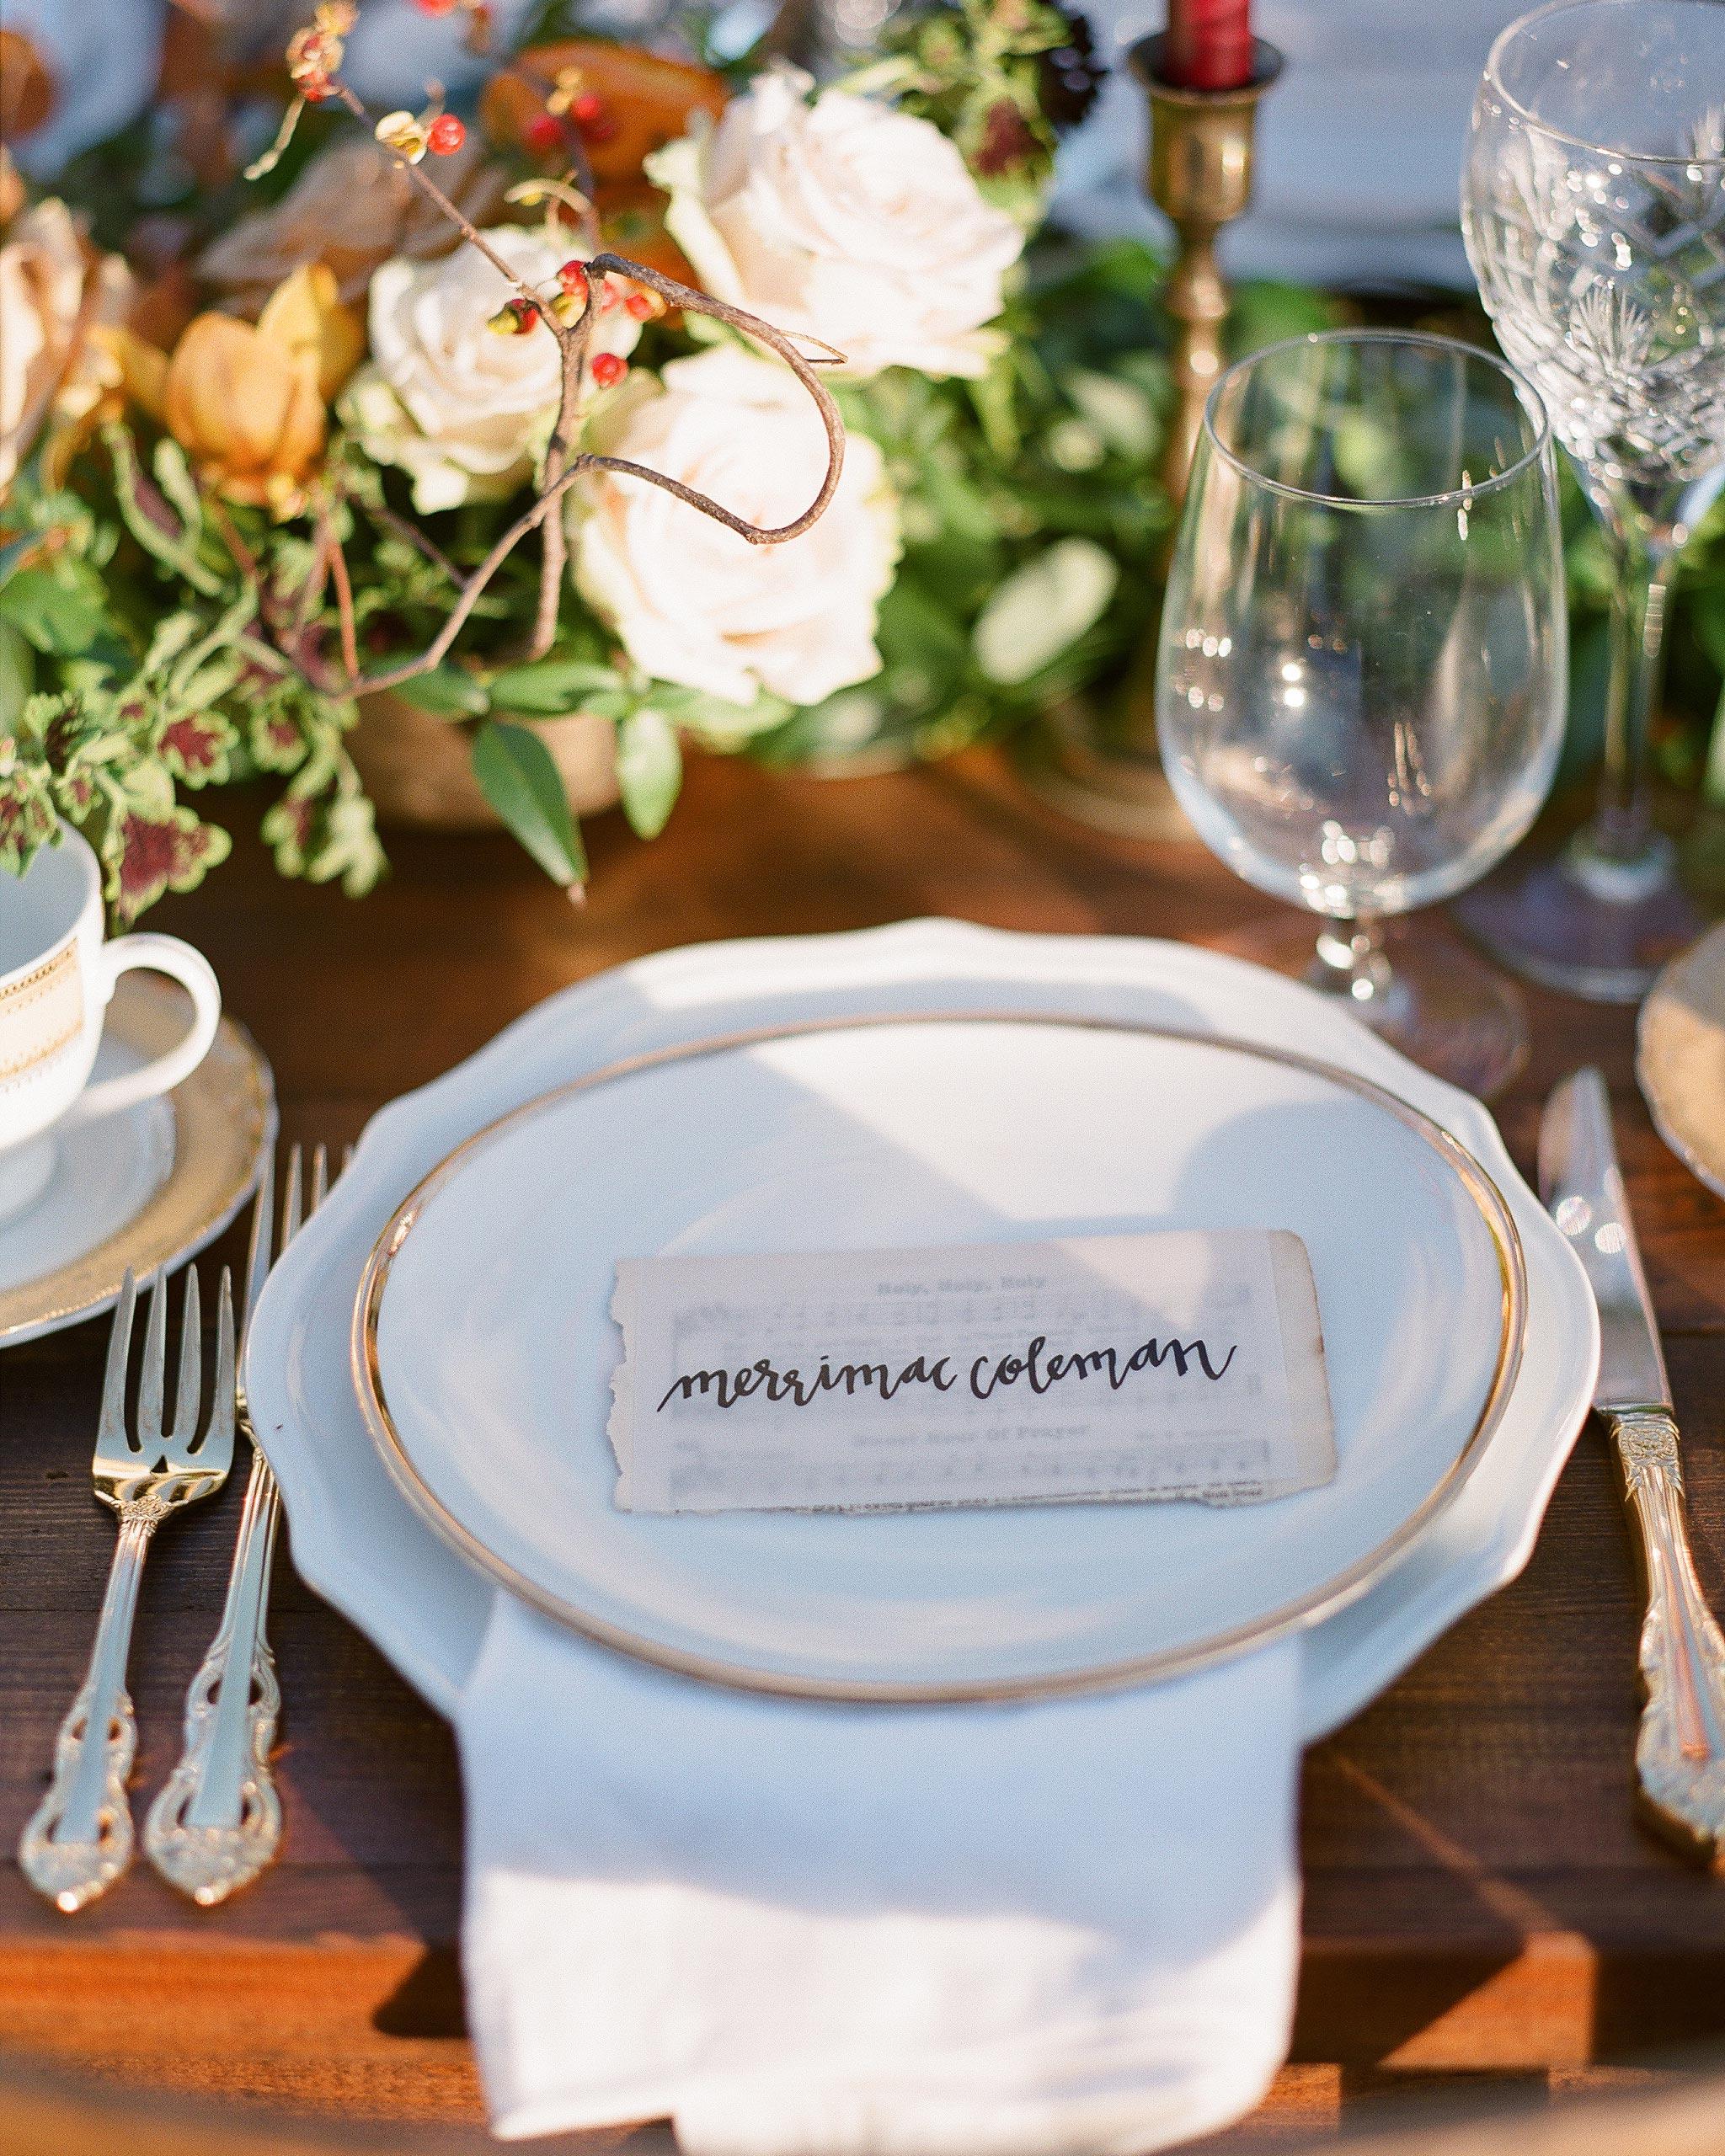 katie-nathan-wedding-thanksgiving-placesetting-410-s113017.jpg